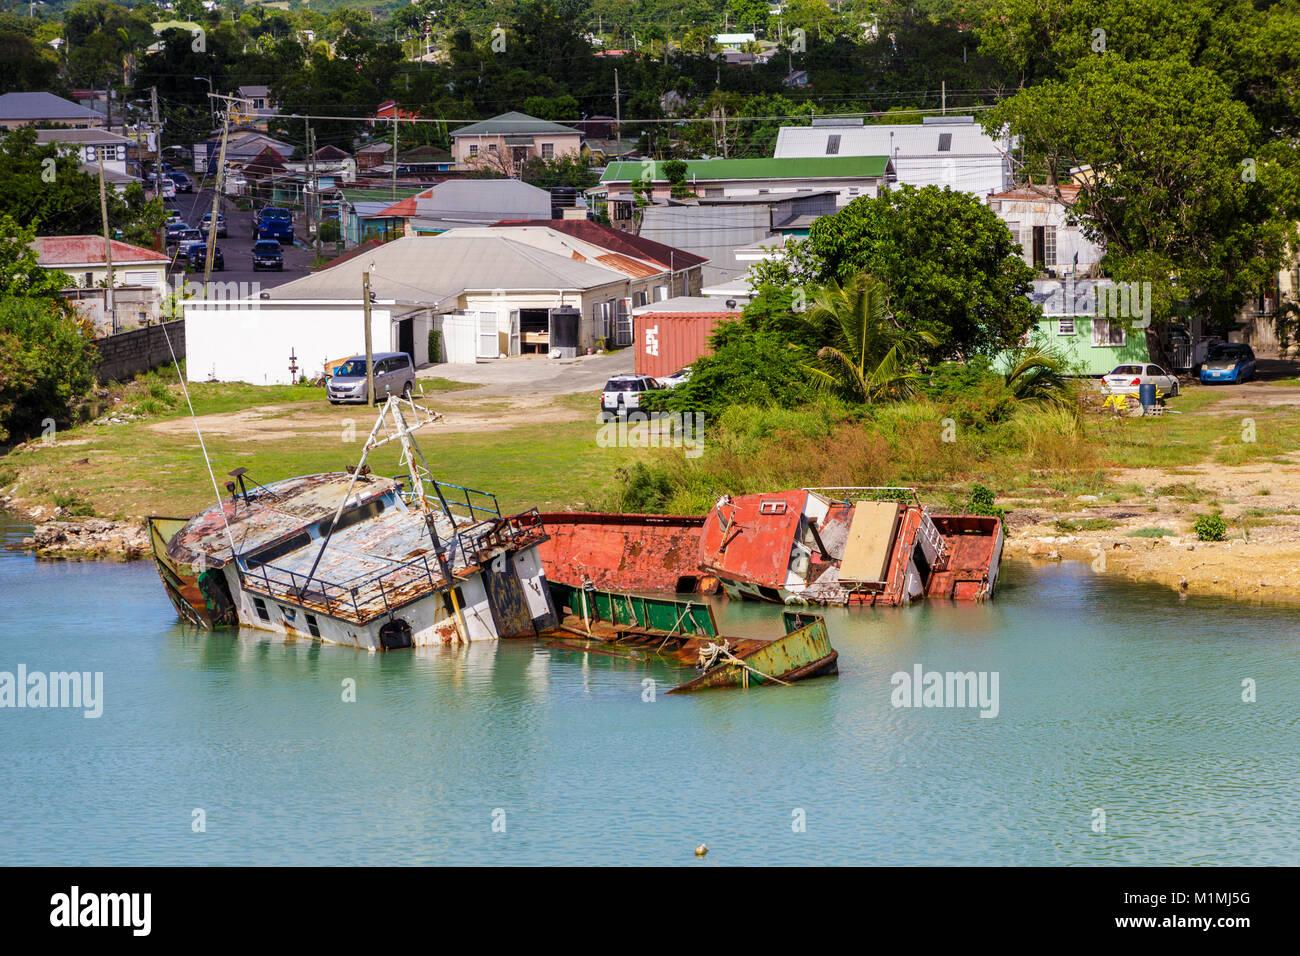 Zwei Wreched Boote vom Hurrikan Irma Stockbild